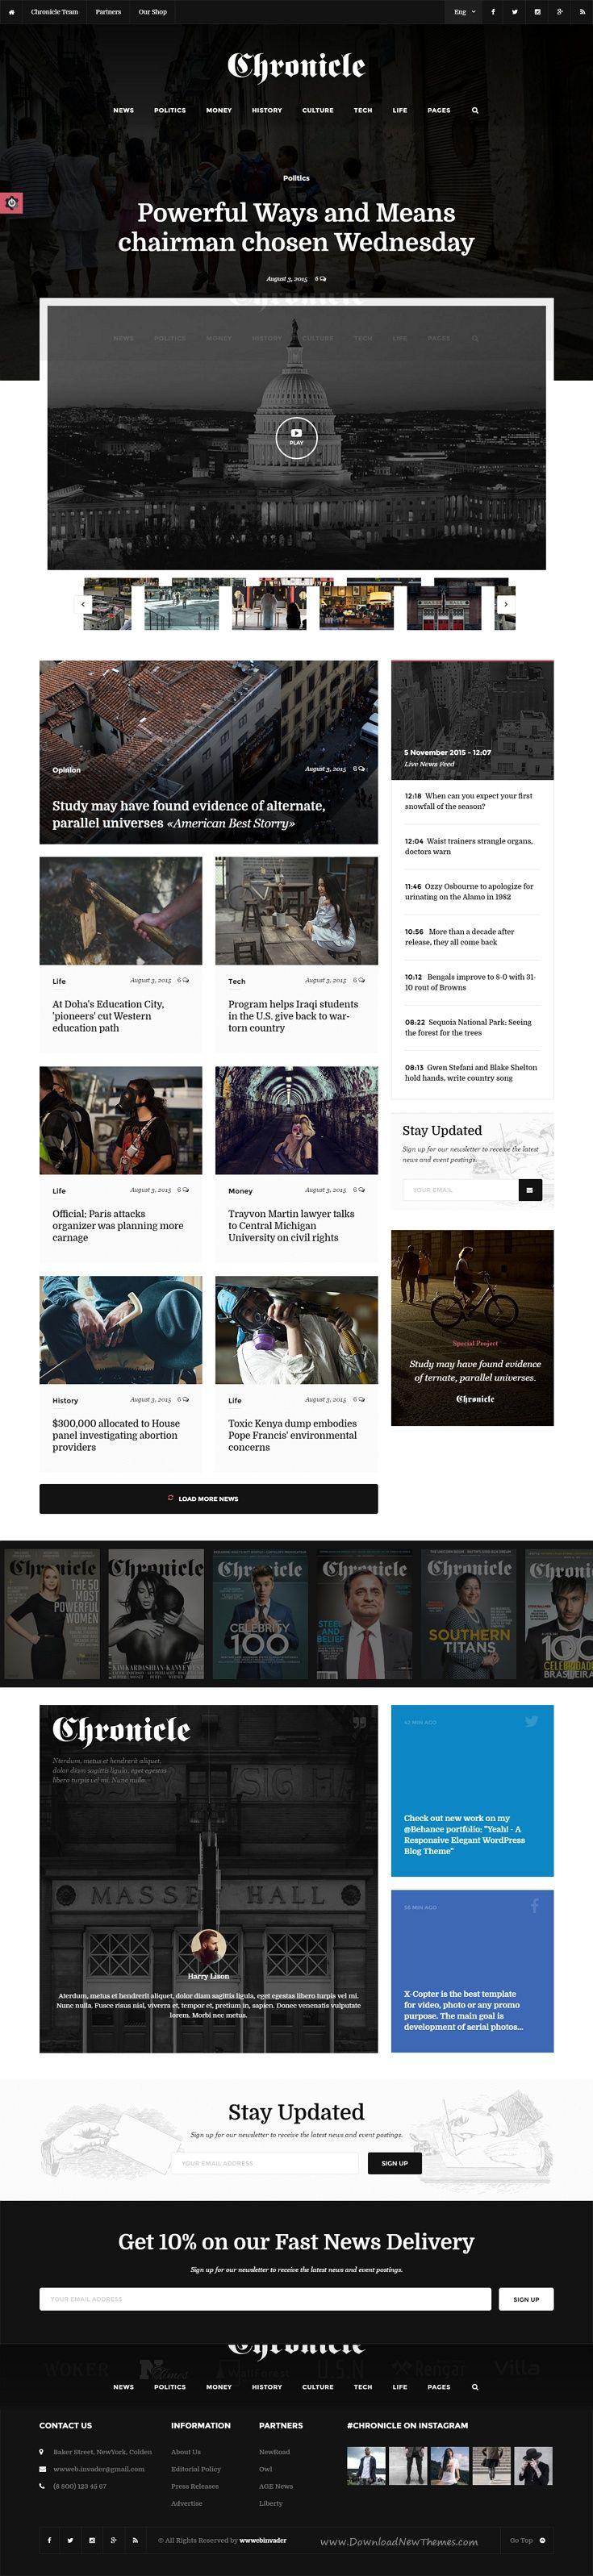 92 best Blog / Magazine Theme images on Pinterest | Website ...